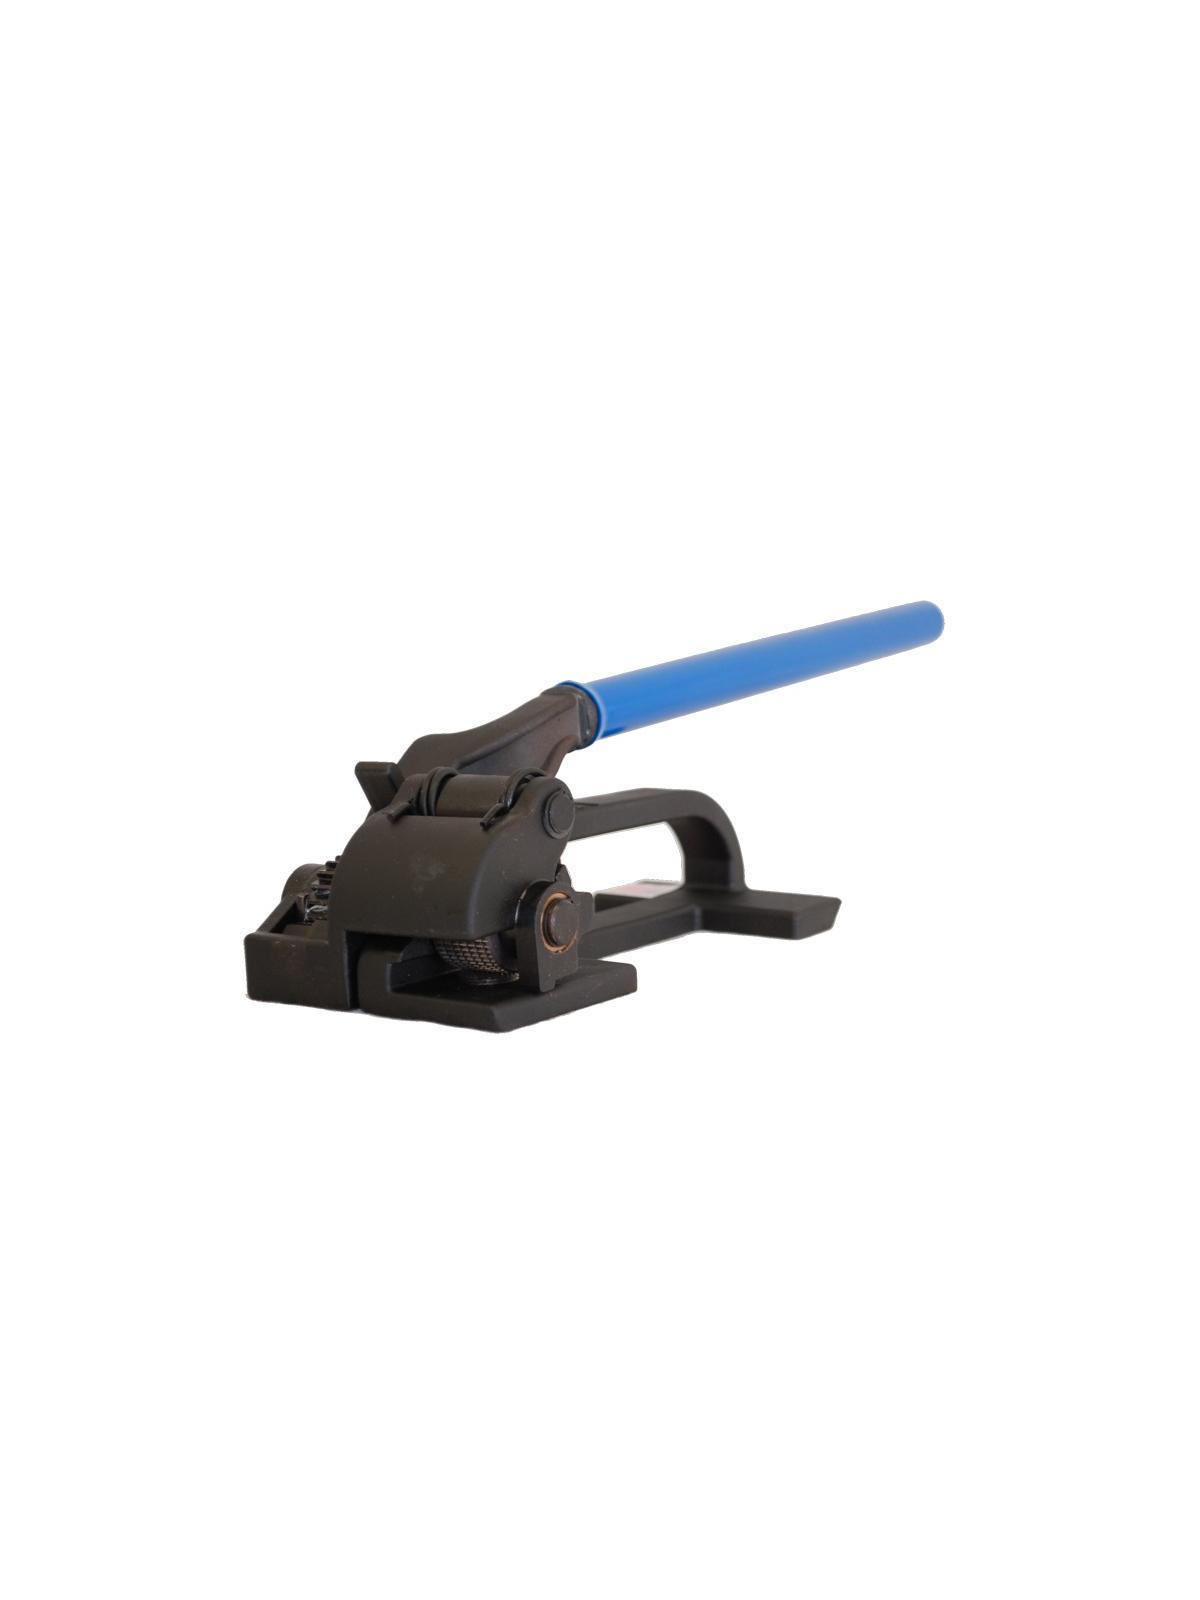 MIP-380 HD Plastic Strap Tensioner 1//2-3//4